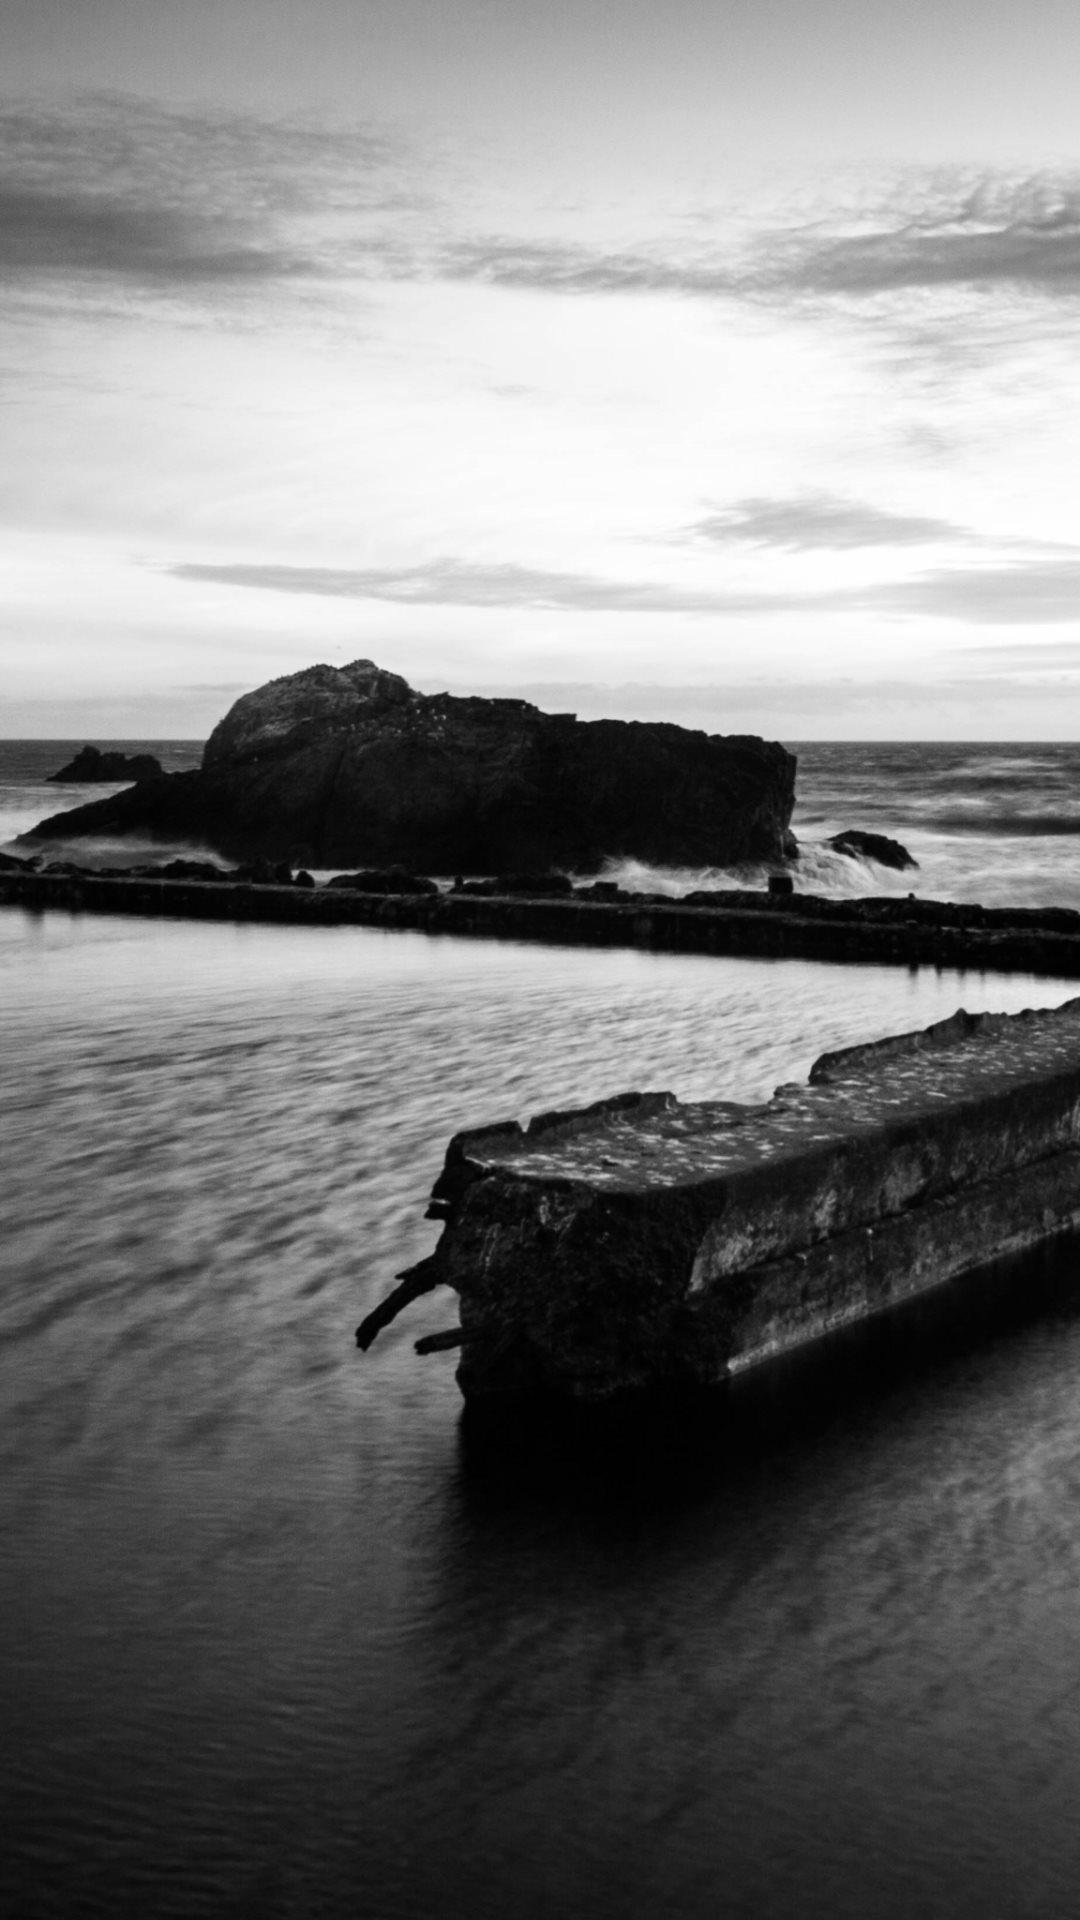 Beach Shore Rocks Black White iPhone 6 Plus HD Wallpaper